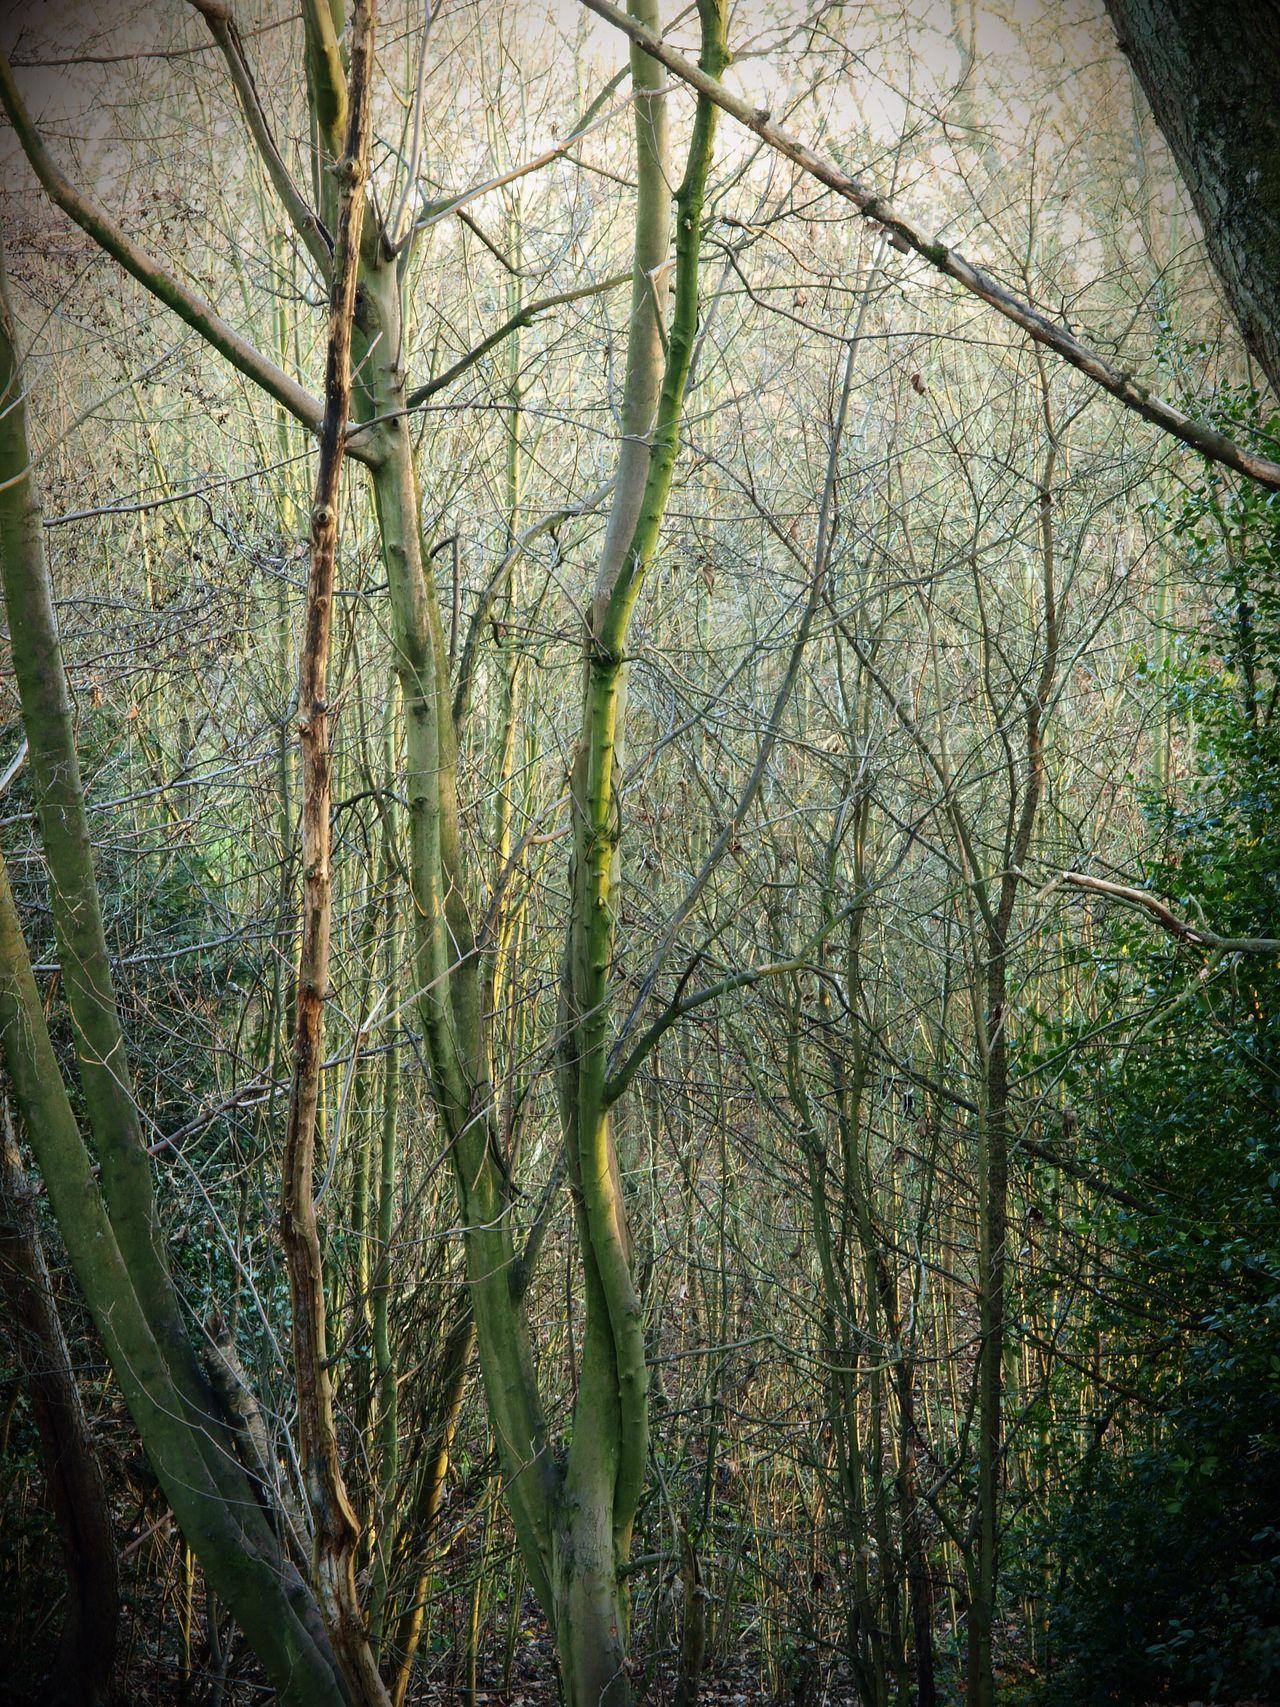 TreePorn Tree Stevesevilempire Hampstead Heath Steve Merrick Olympus WoodLand Zuiko Tree Forest Nature Tranquility Trees Winter